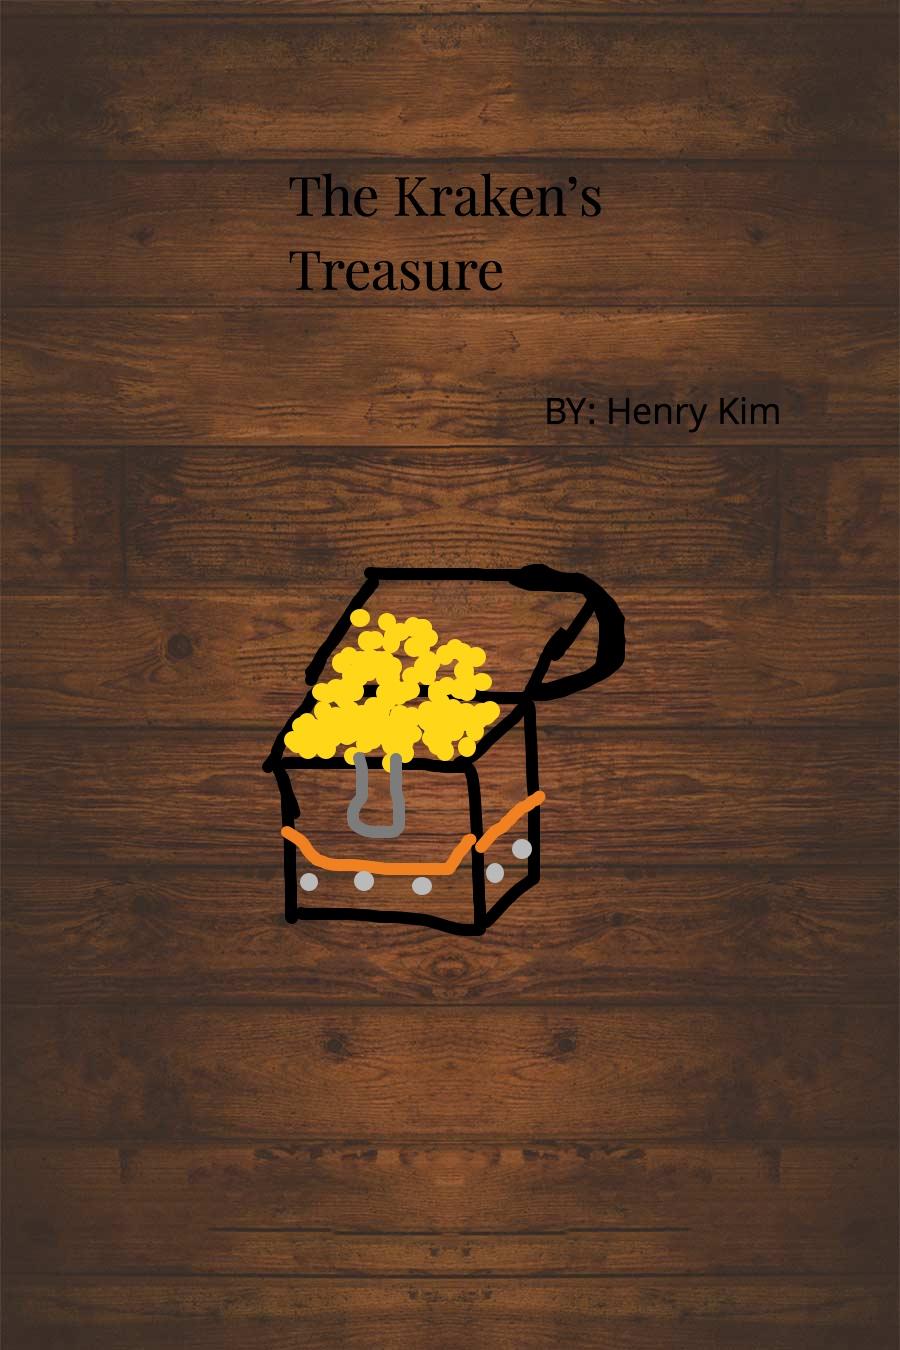 The Kraken's Treasure